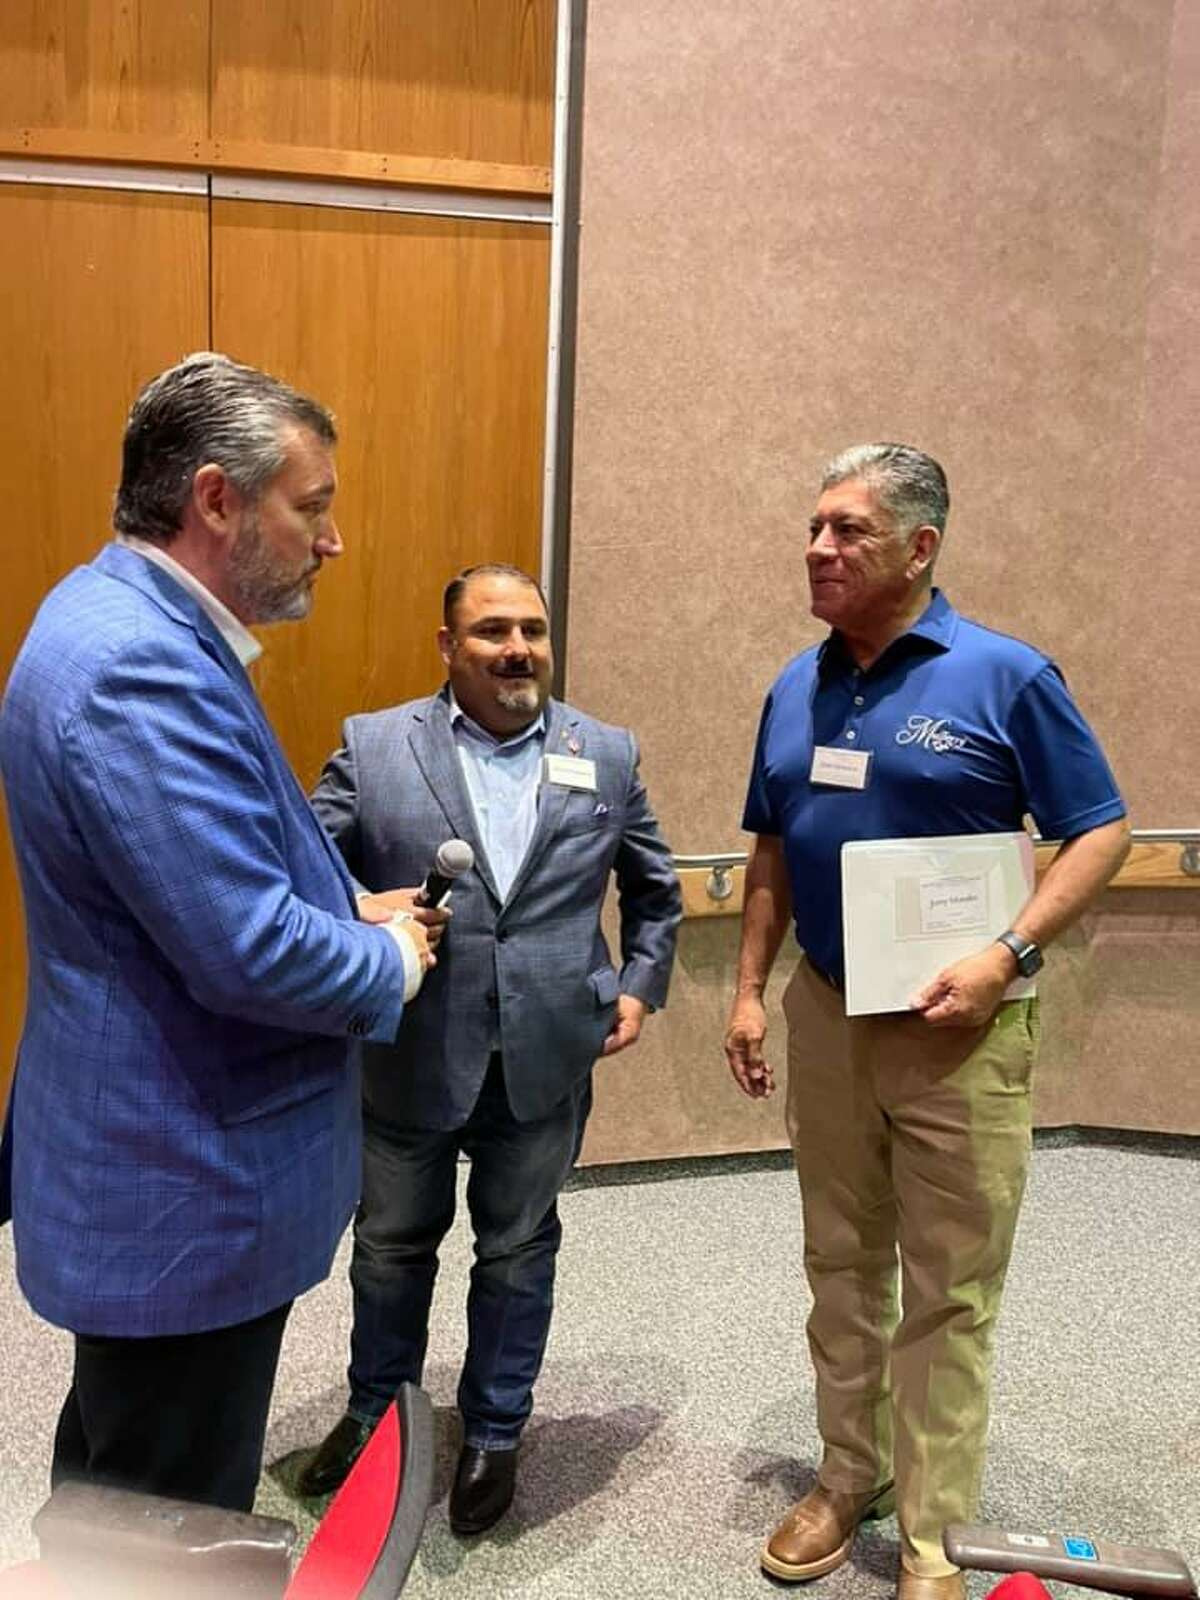 U.S. Sen Ted Cruz (left) talks with co-host Adrian Carrasco and former Midland Mayor Jerry Morales on Thursday.